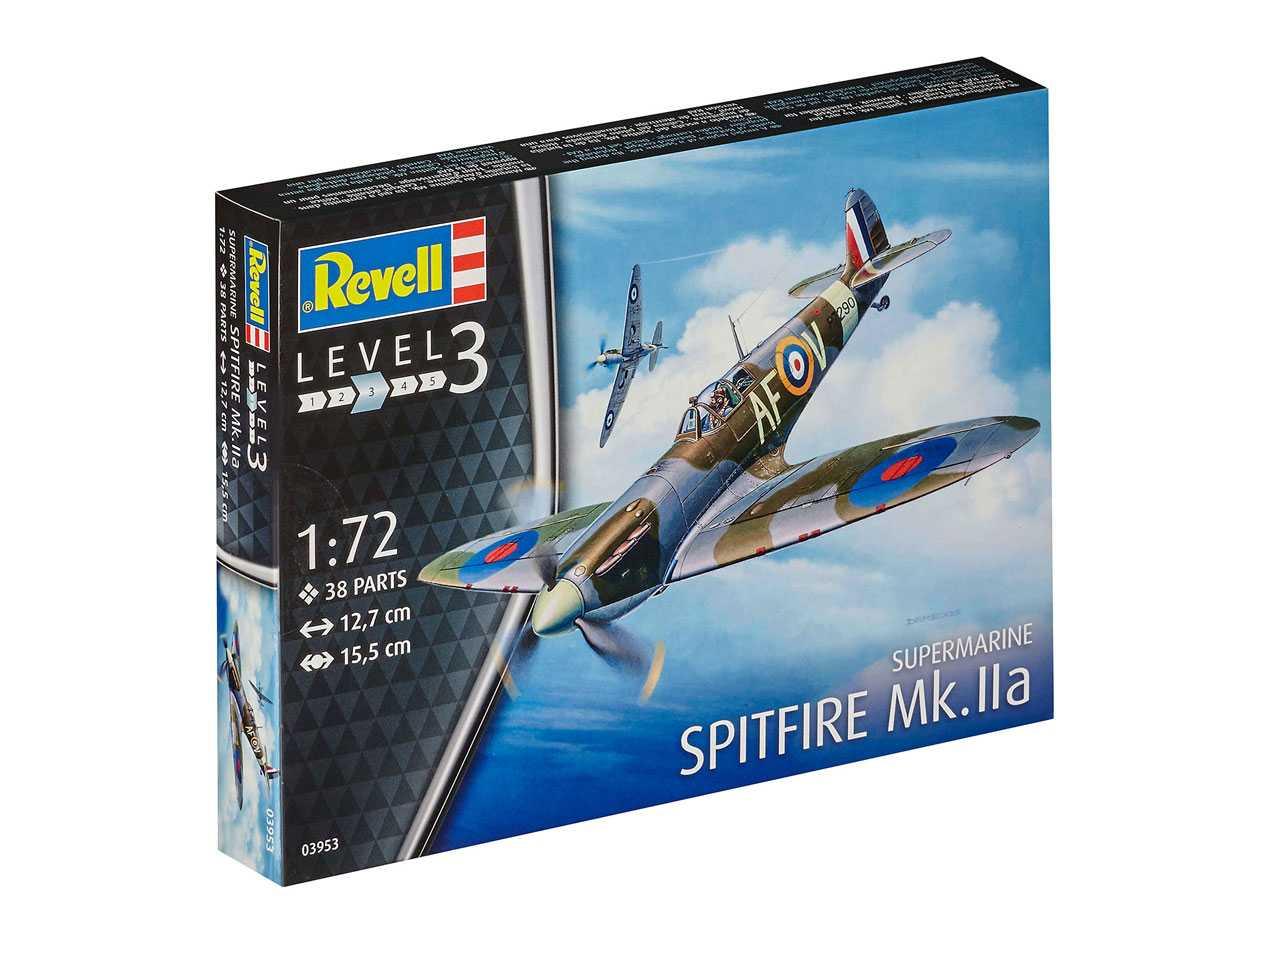 1:72 Supermarine Spitfire Mk.IIa